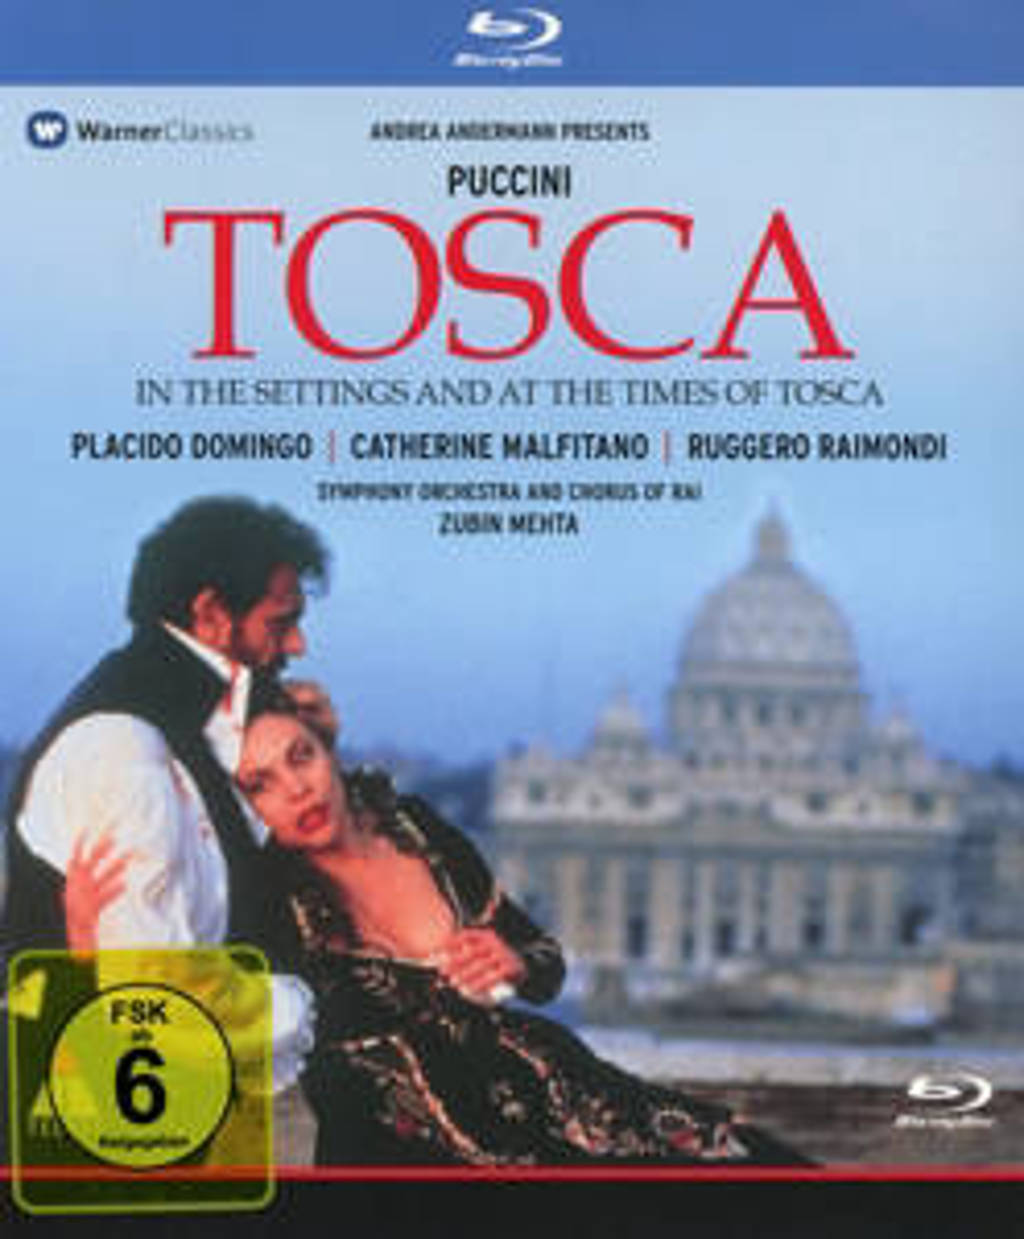 Andrea Andermann - Puccini: Tosca (DVD)